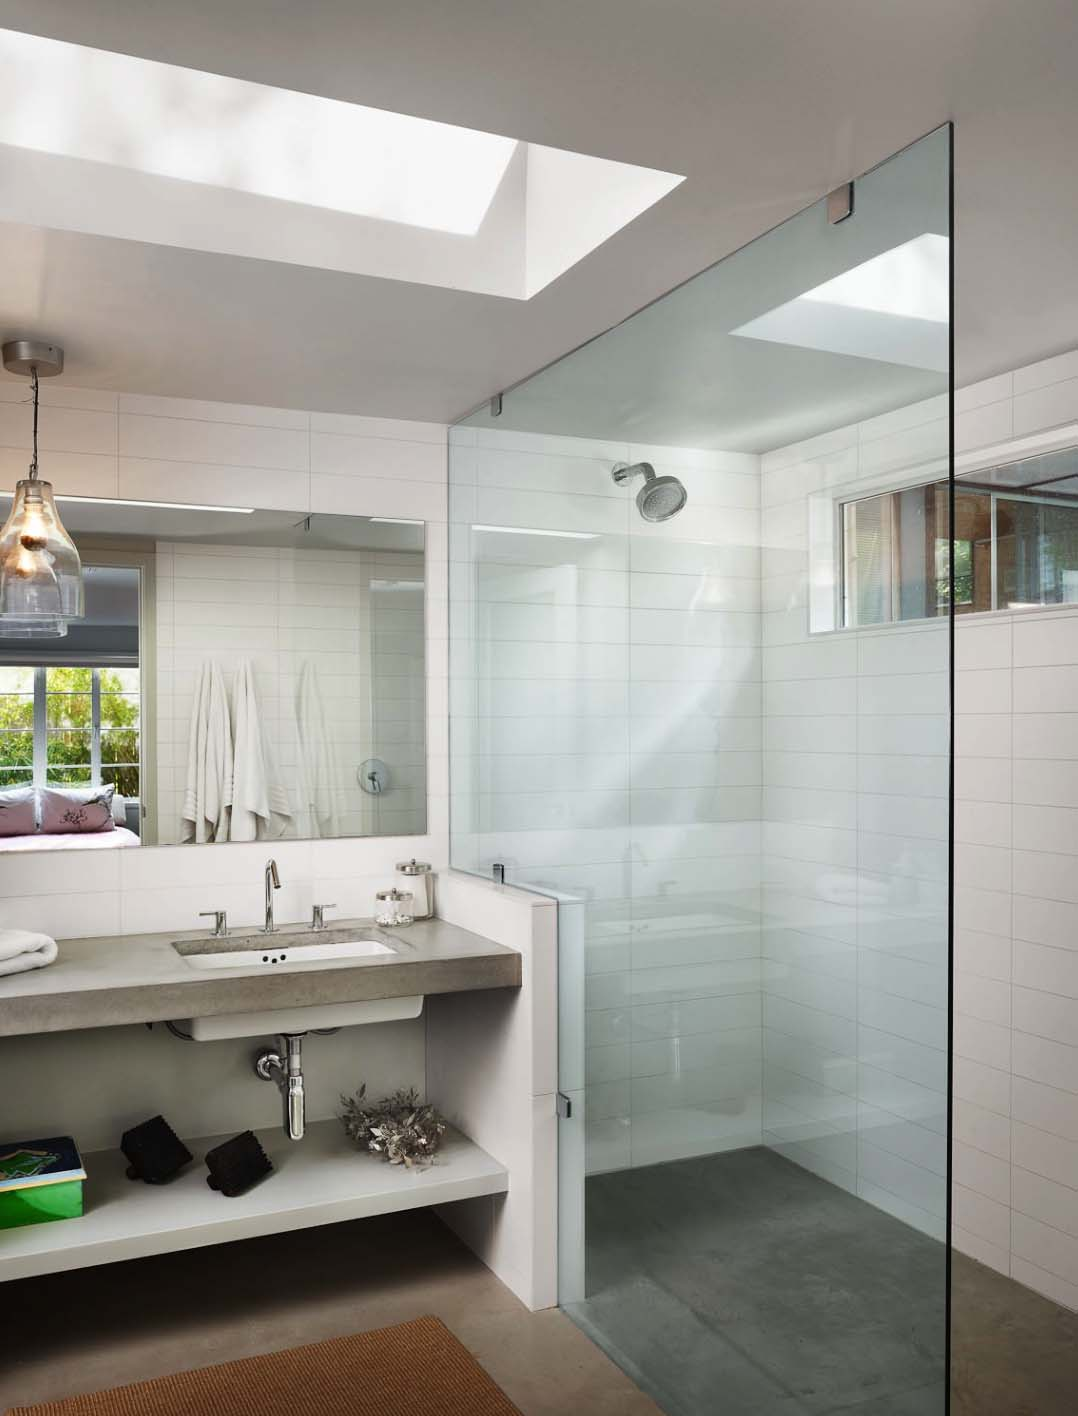 Concrete Bathroom Designs-09-1 Kindesign